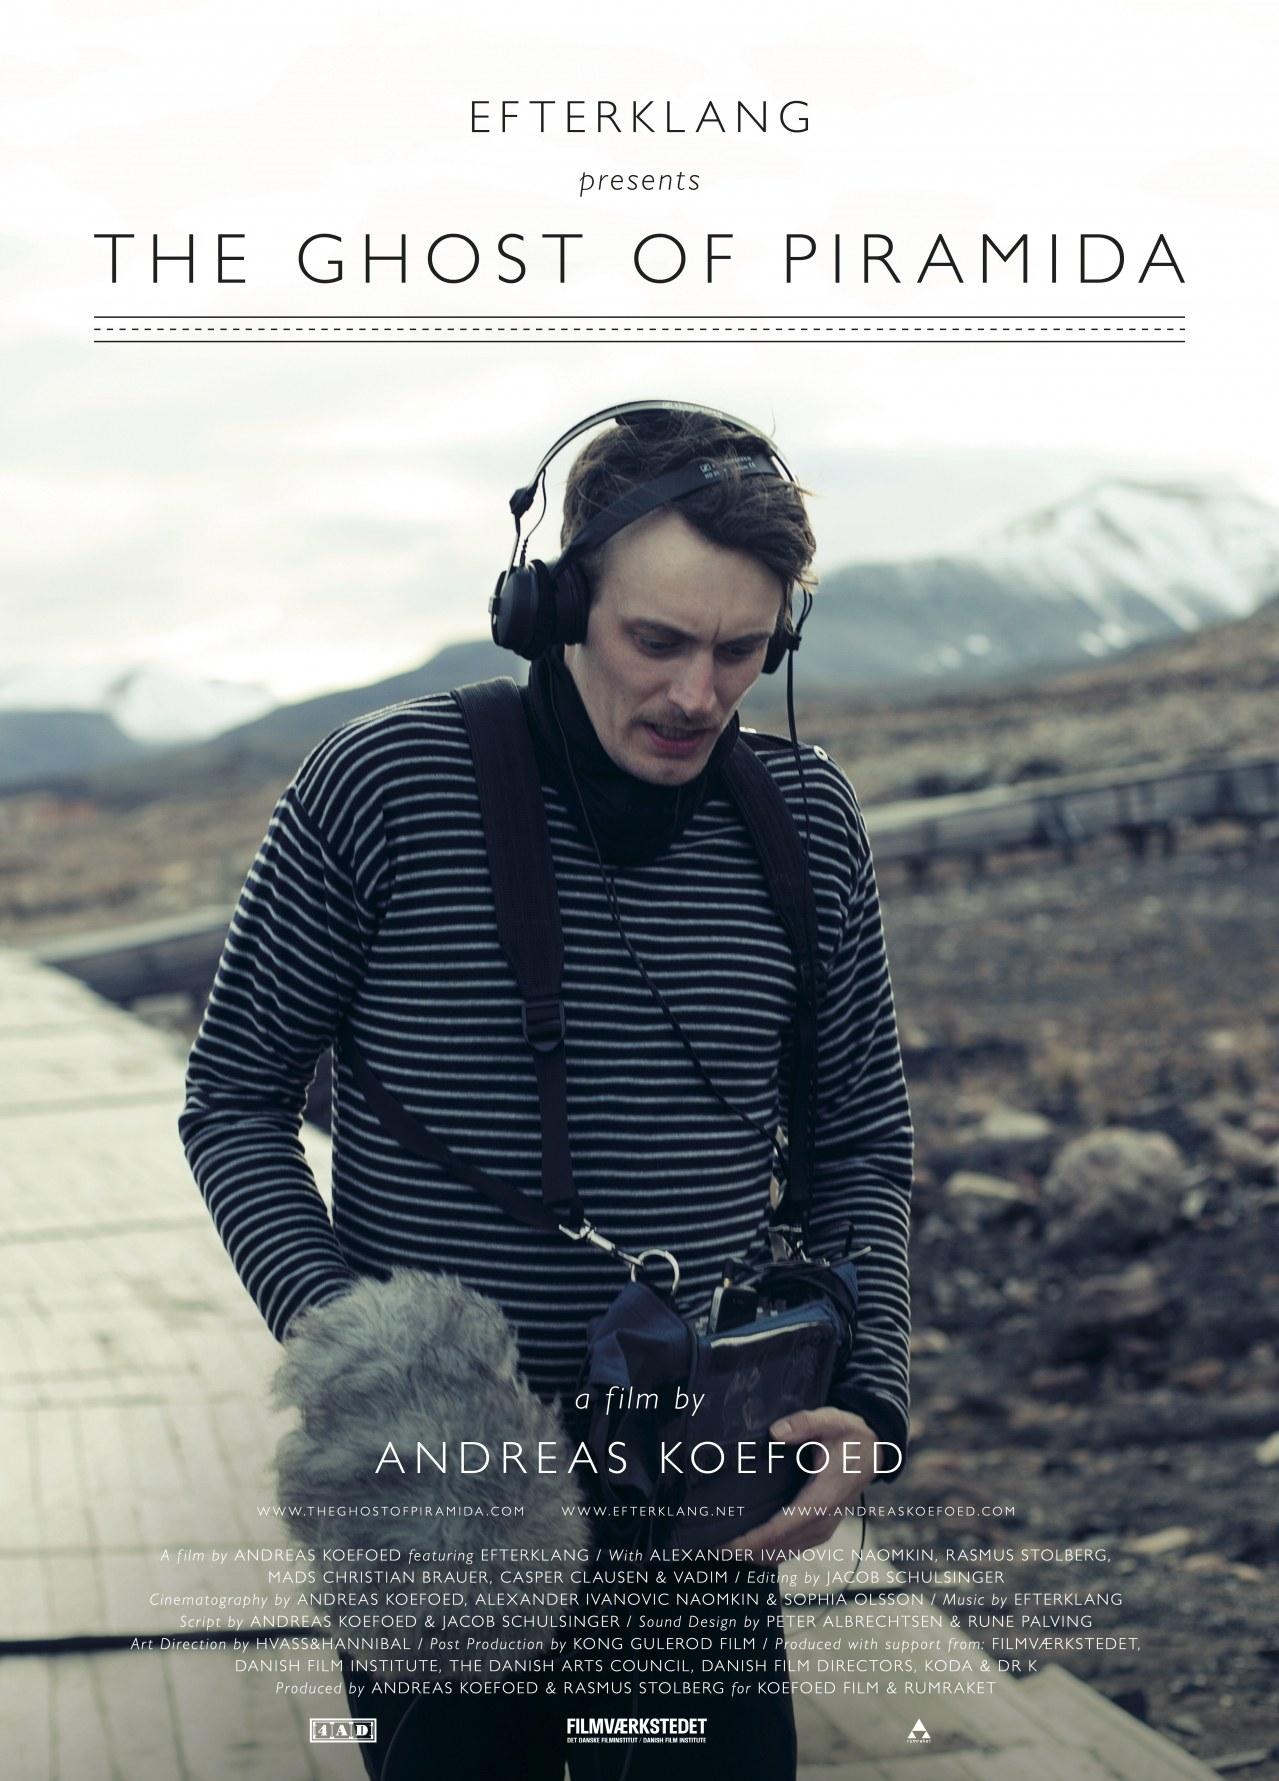 The Ghost of Piramida - Bild 1